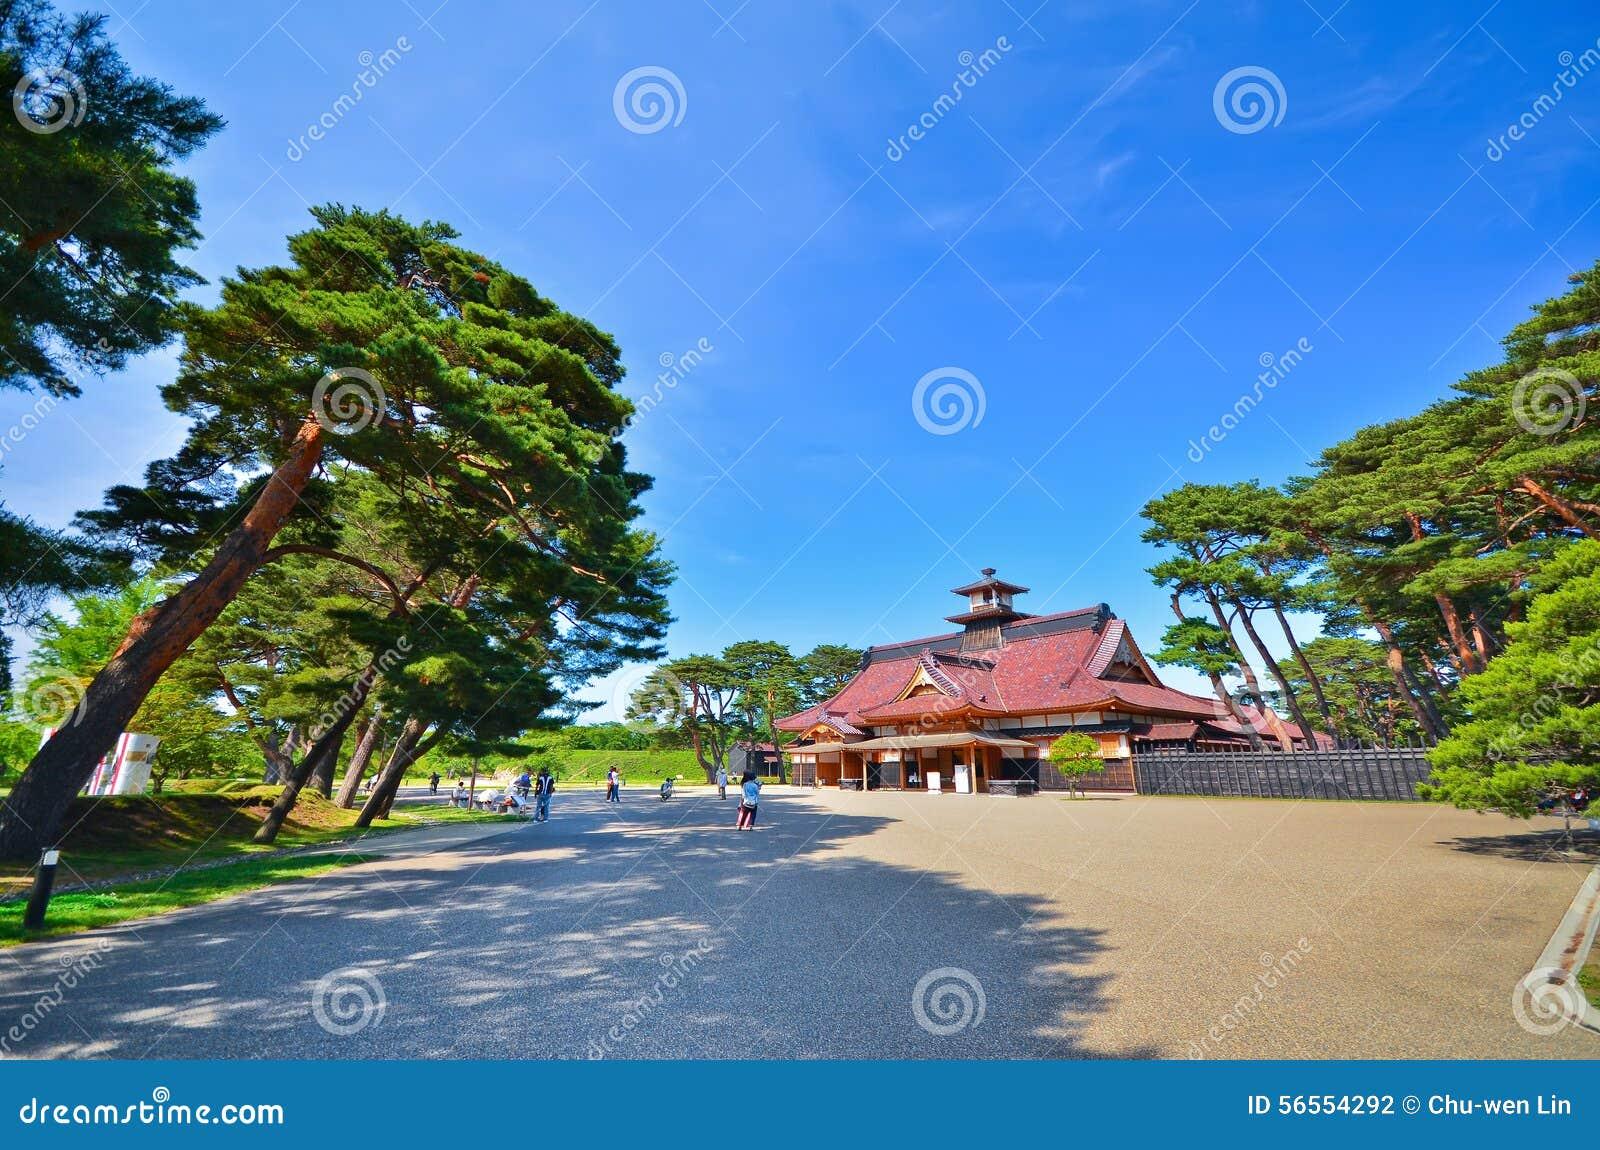 Download Ιαπωνικός ναός το καλοκαίρι Στοκ Εικόνες - εικόνα από συλλογιστείτε, κήπος: 56554292